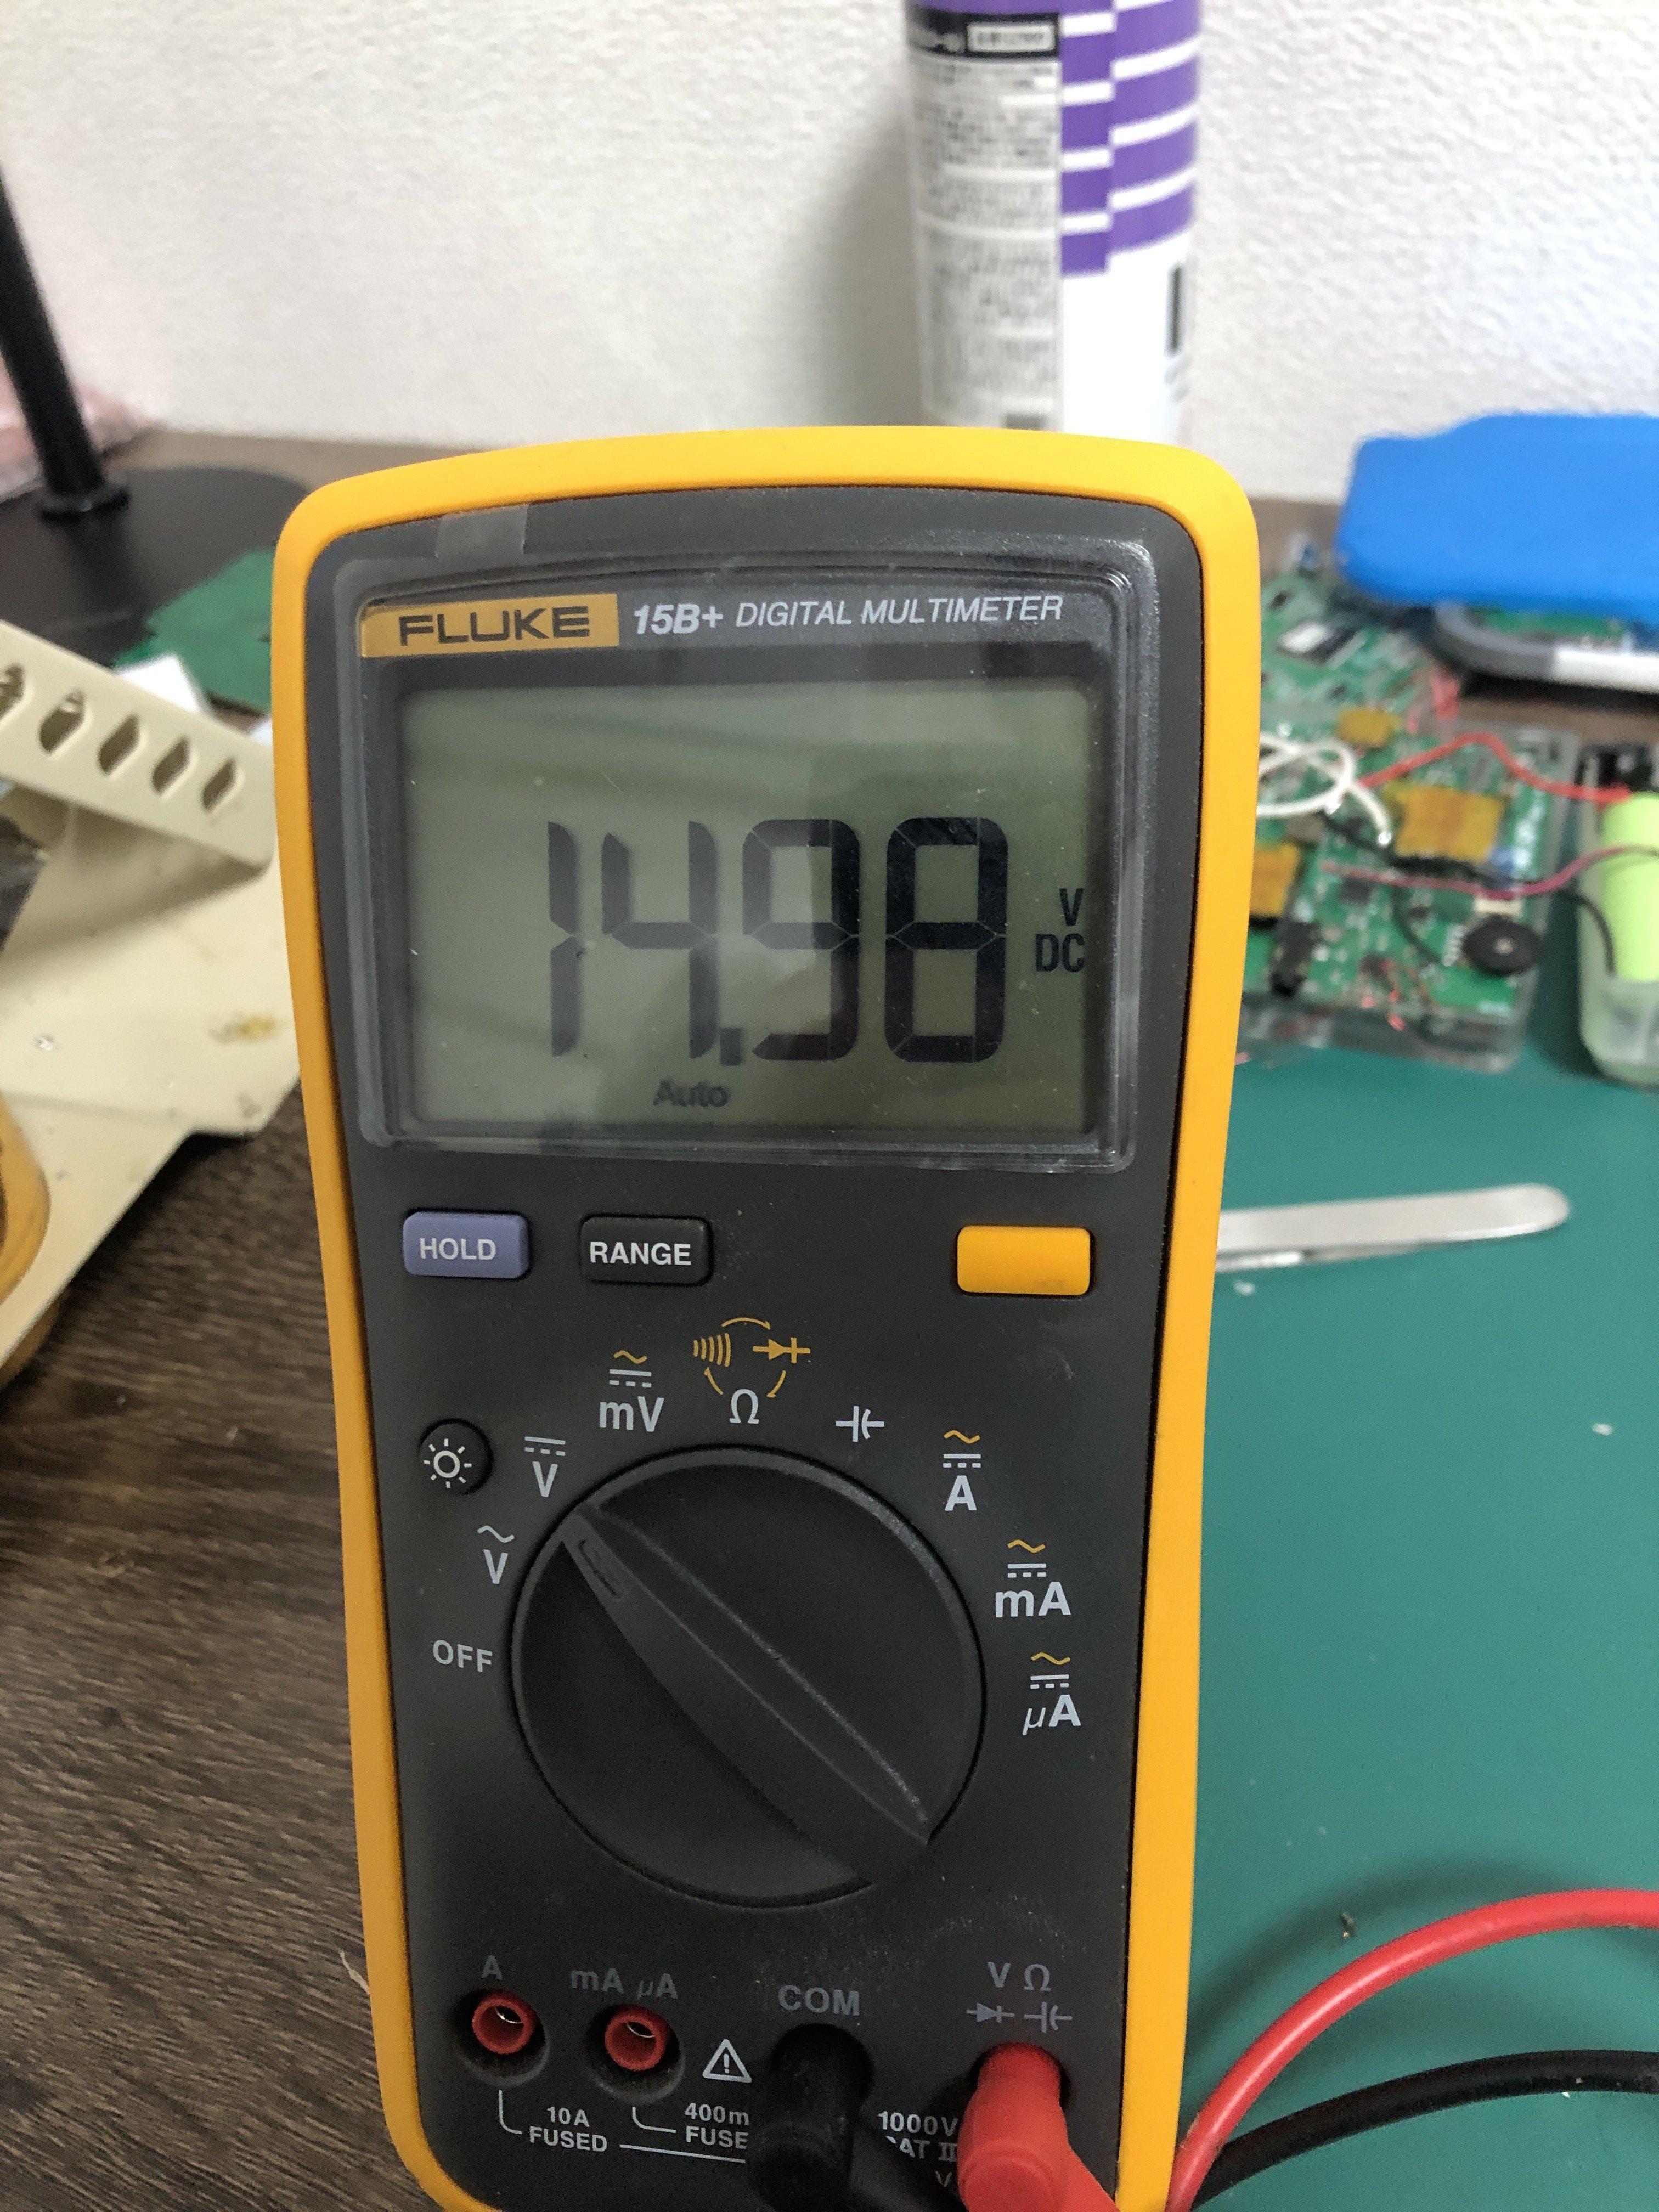 A9CA8800-DF20-4D0B-9795-ED232E8460E0.jpeg